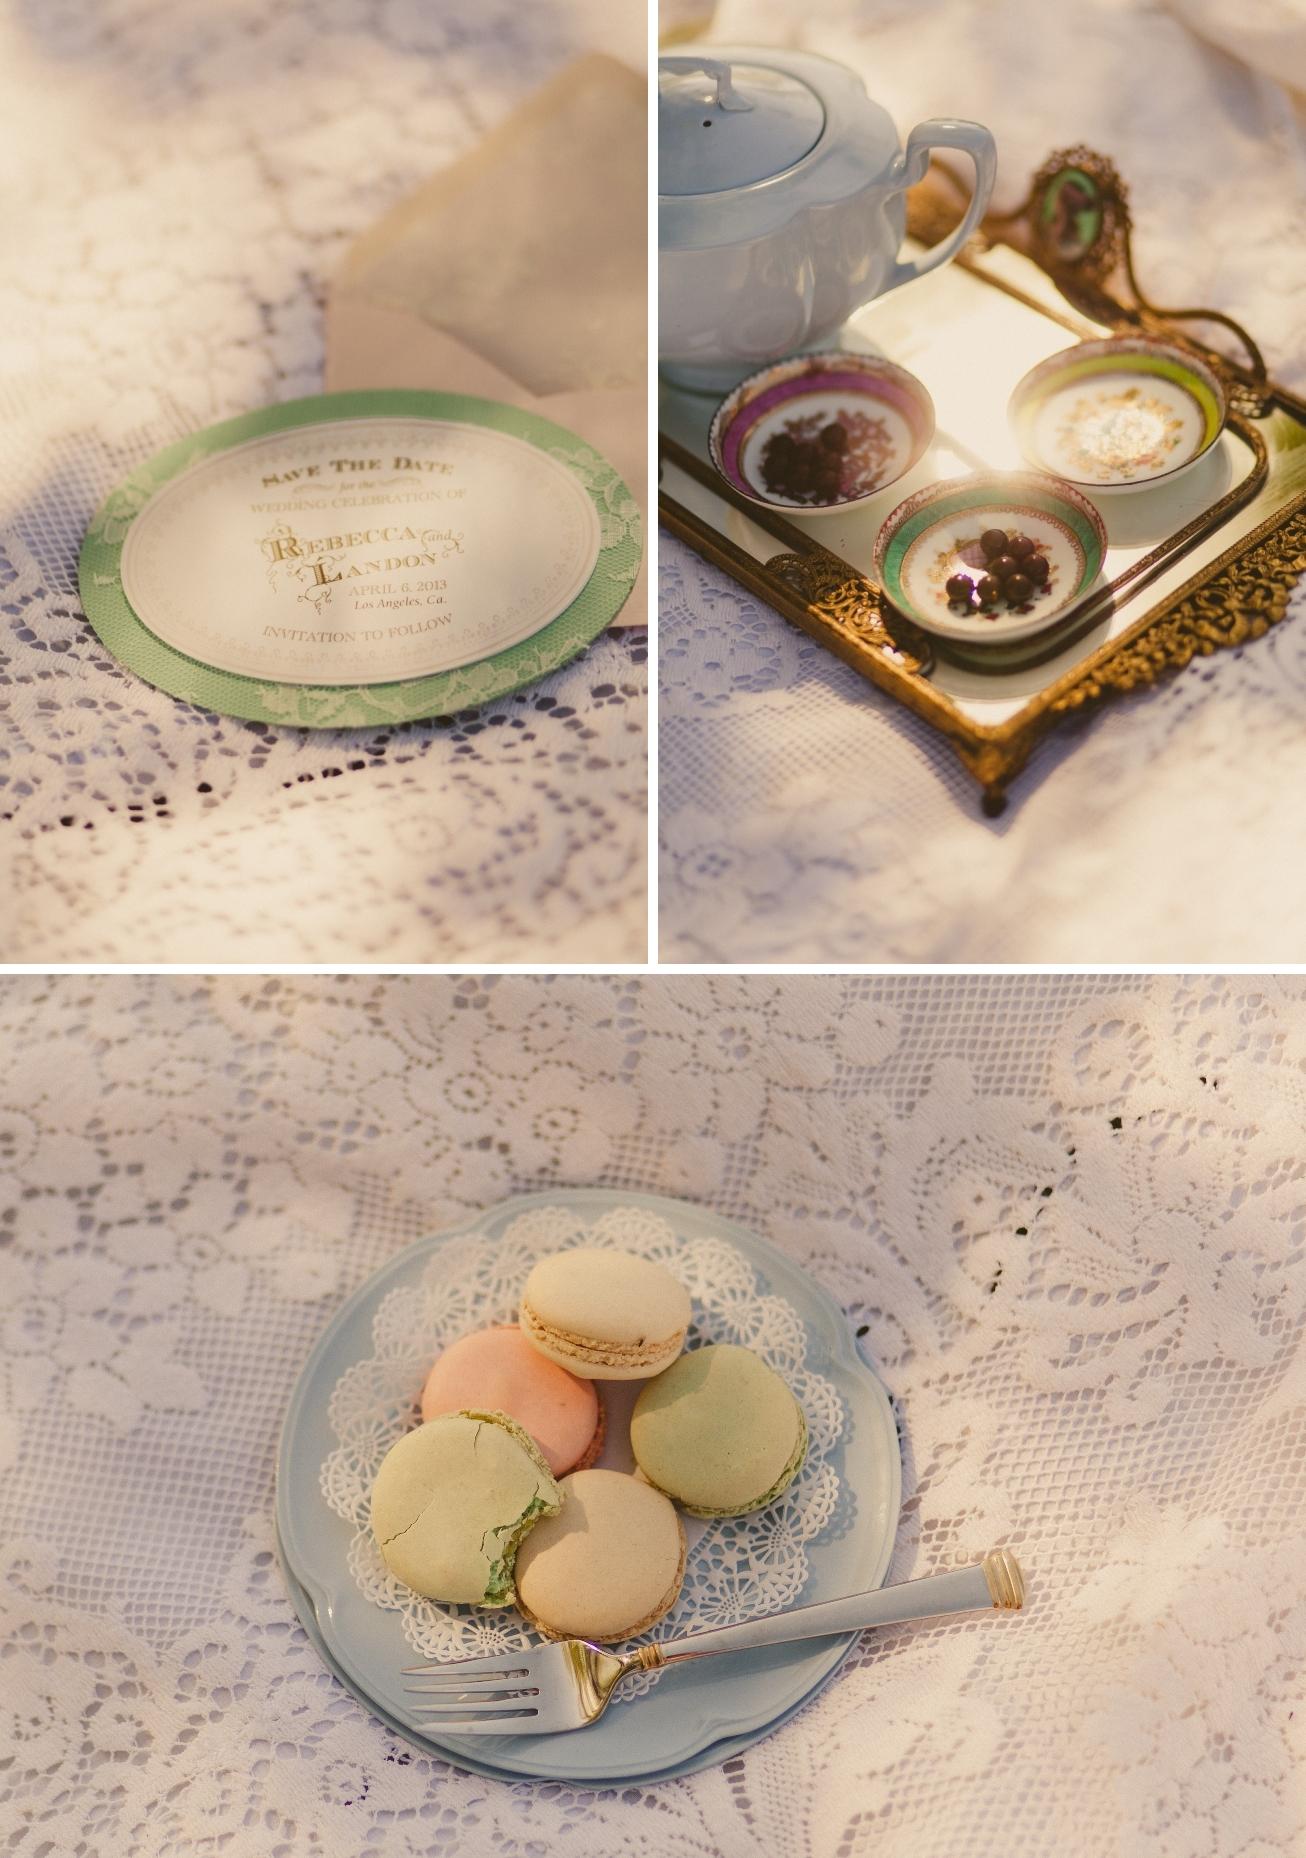 Noaki's new collection captured by Yuna Leonard